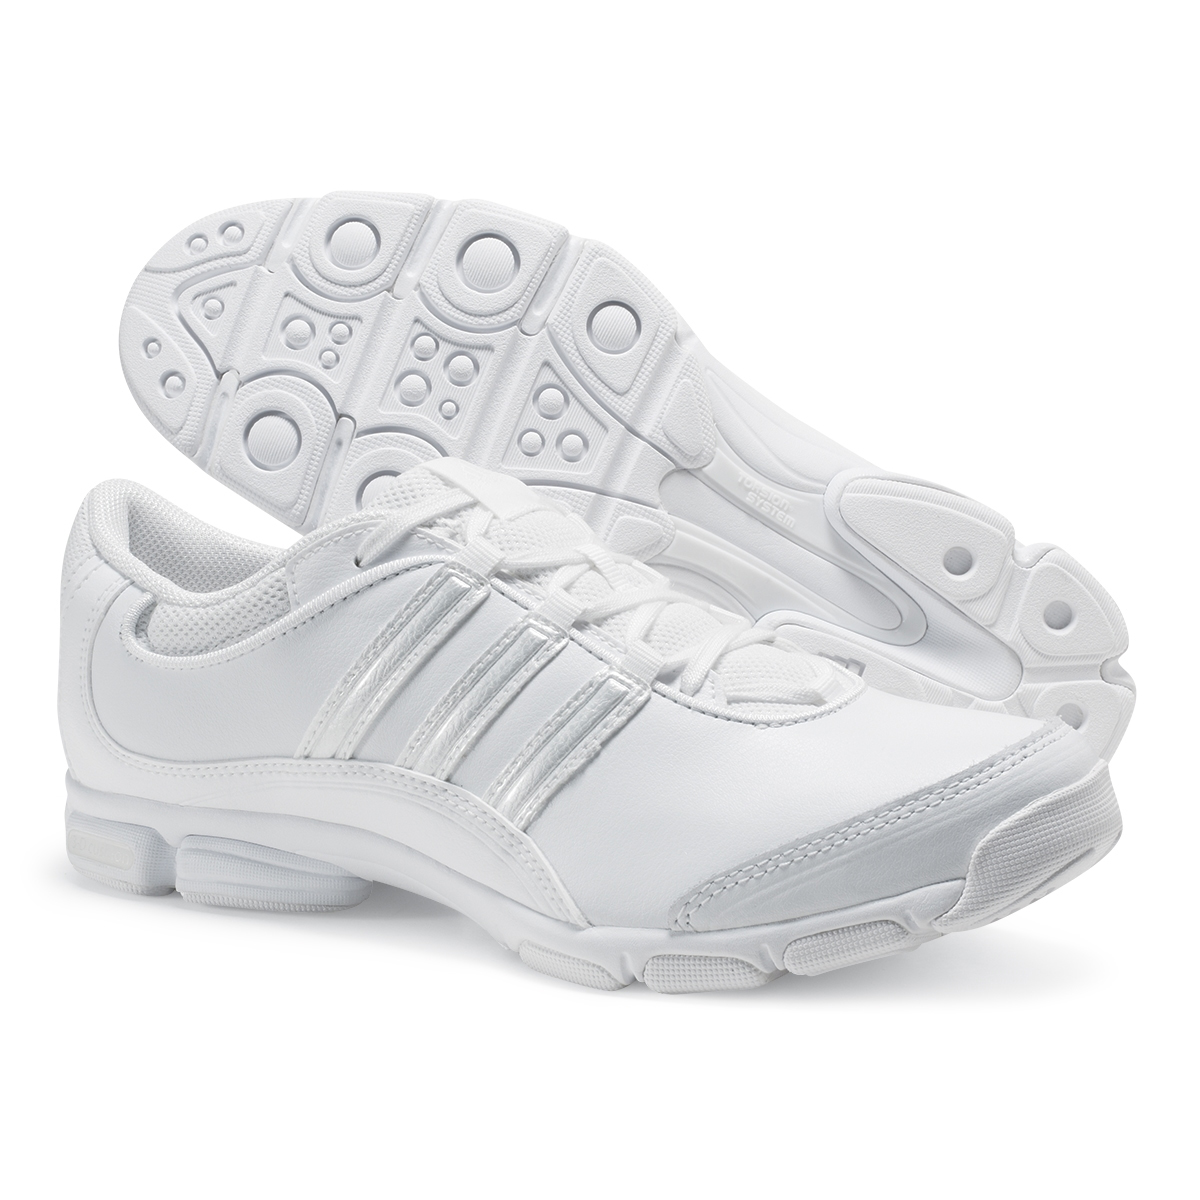 9f6357dae49246 Adidas Cheer Sport Cheer Shoe